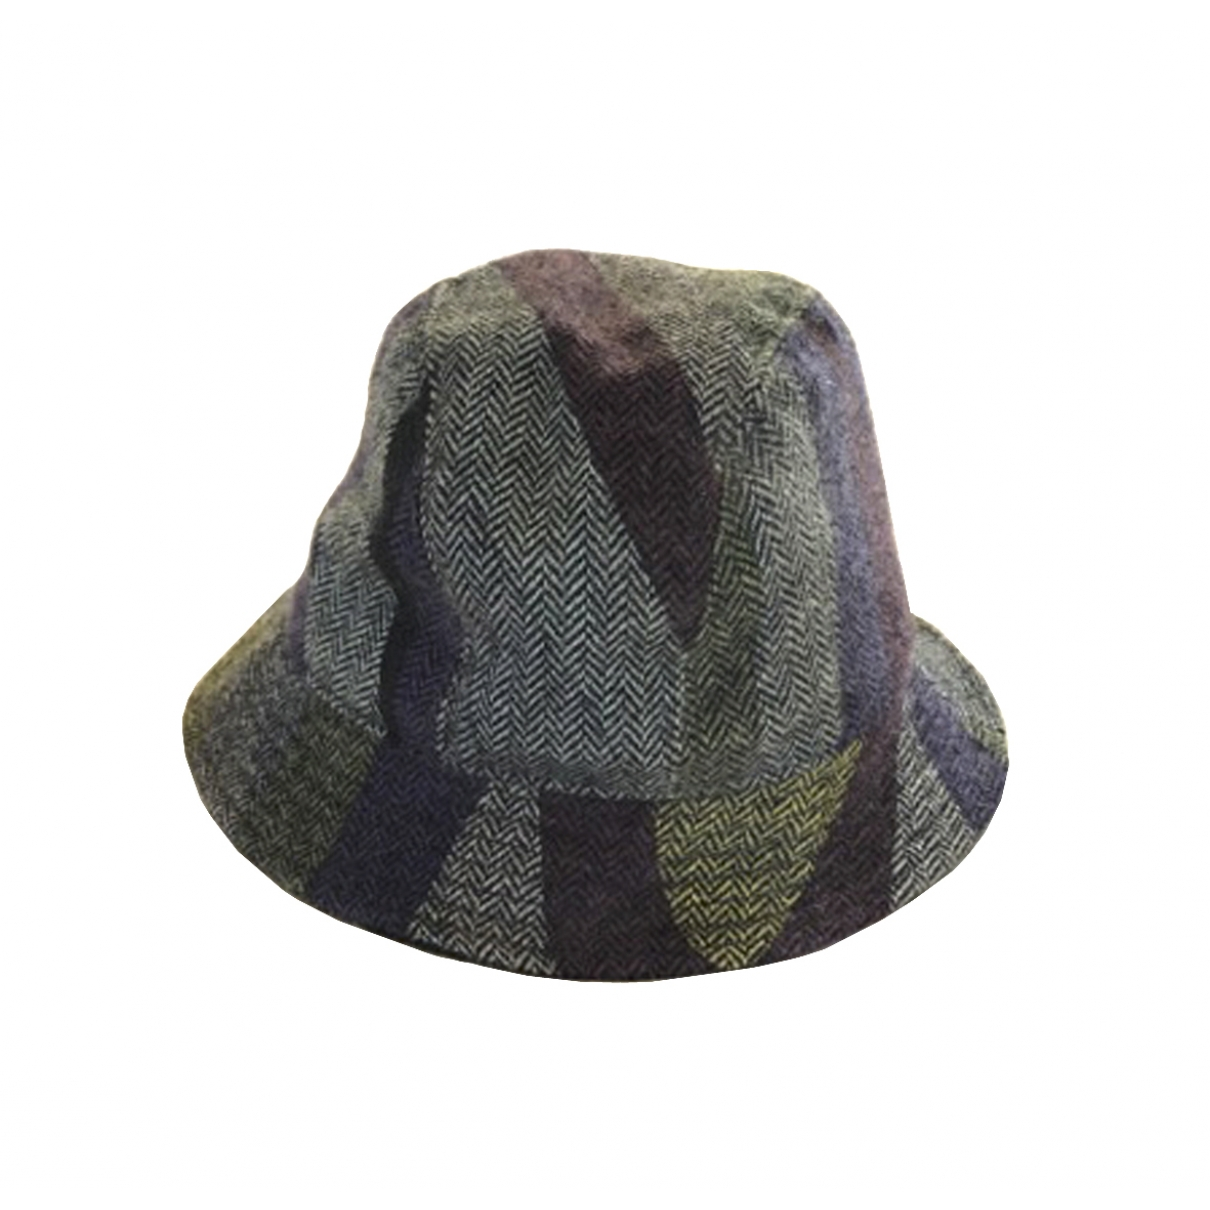 Emilio Pucci \N Wool hat for Women S International